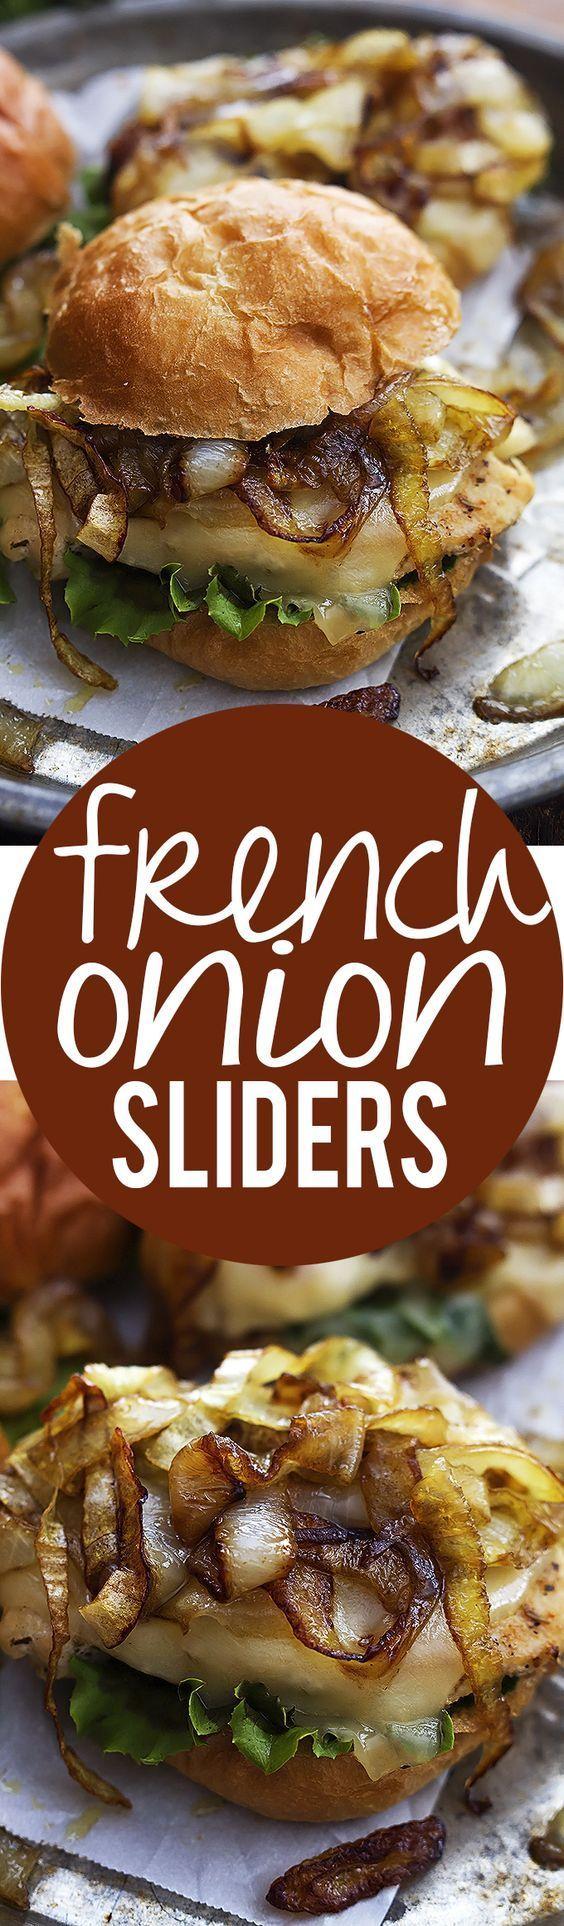 French Onion Chicken Sliders | Recipe